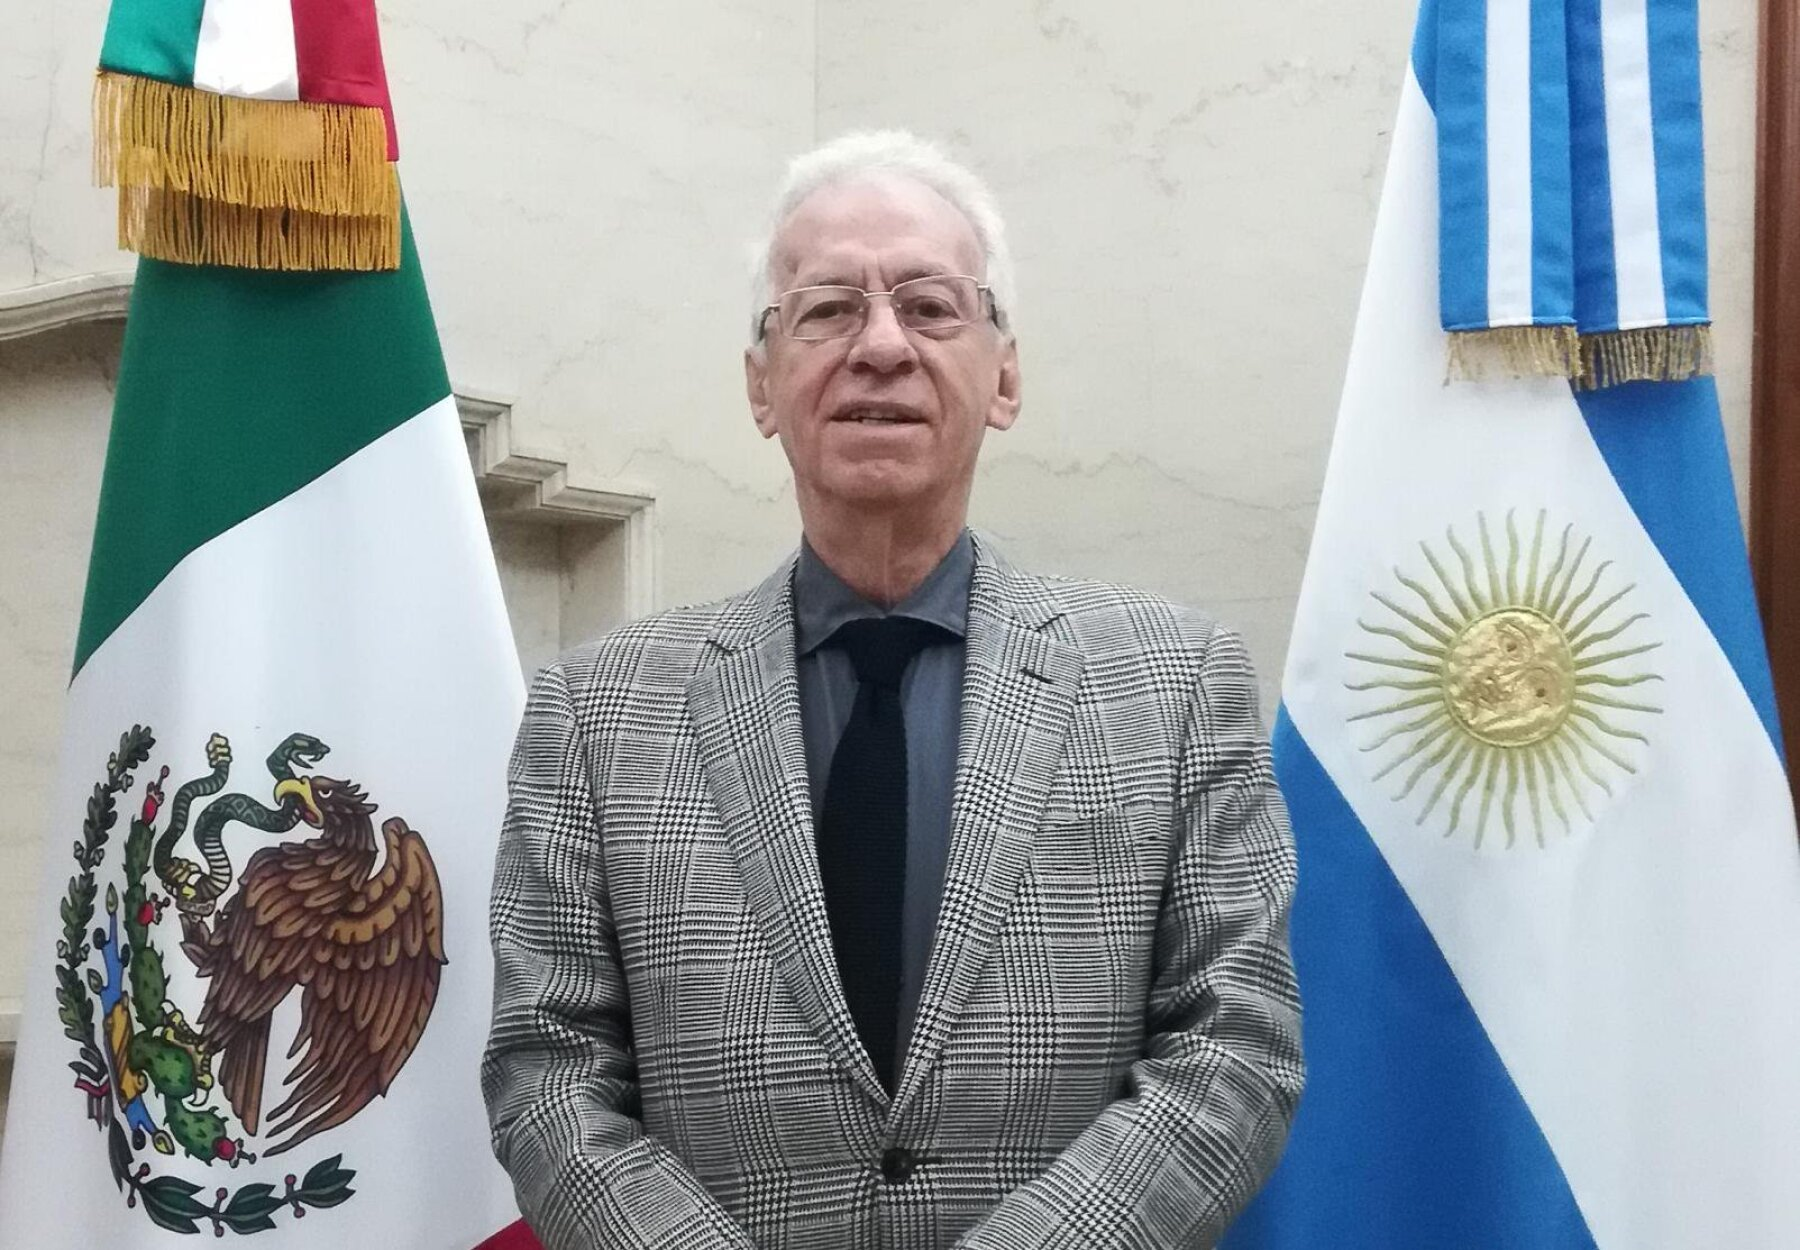 Óscar Ricardo Valero Recio Becerra,